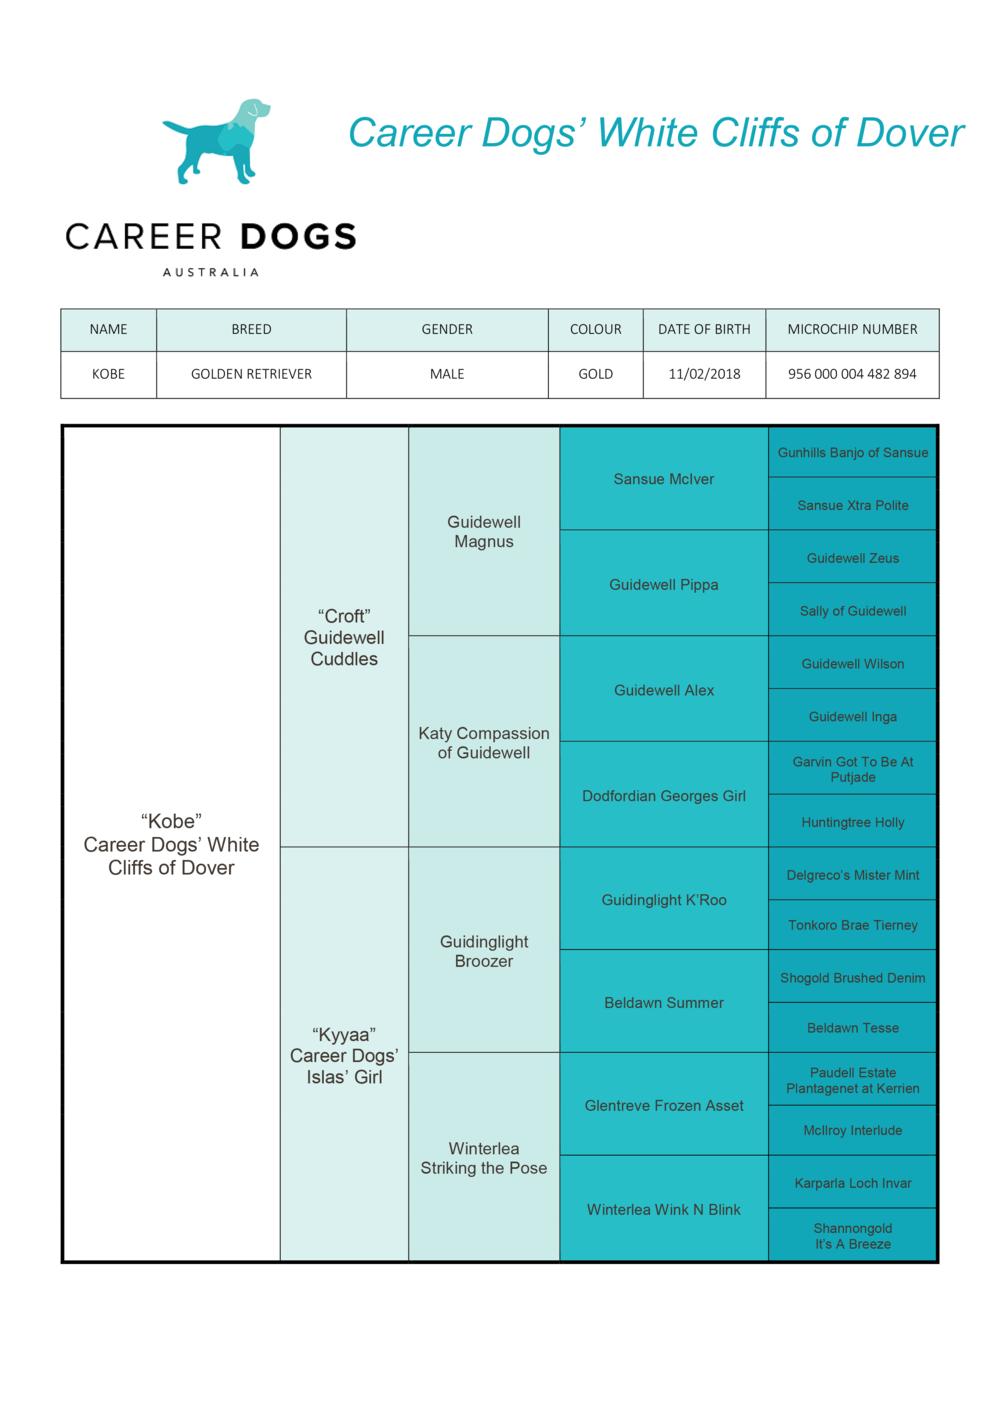 Kobe_Pedigree_Career Dogs' White Cliffs of Dover.png